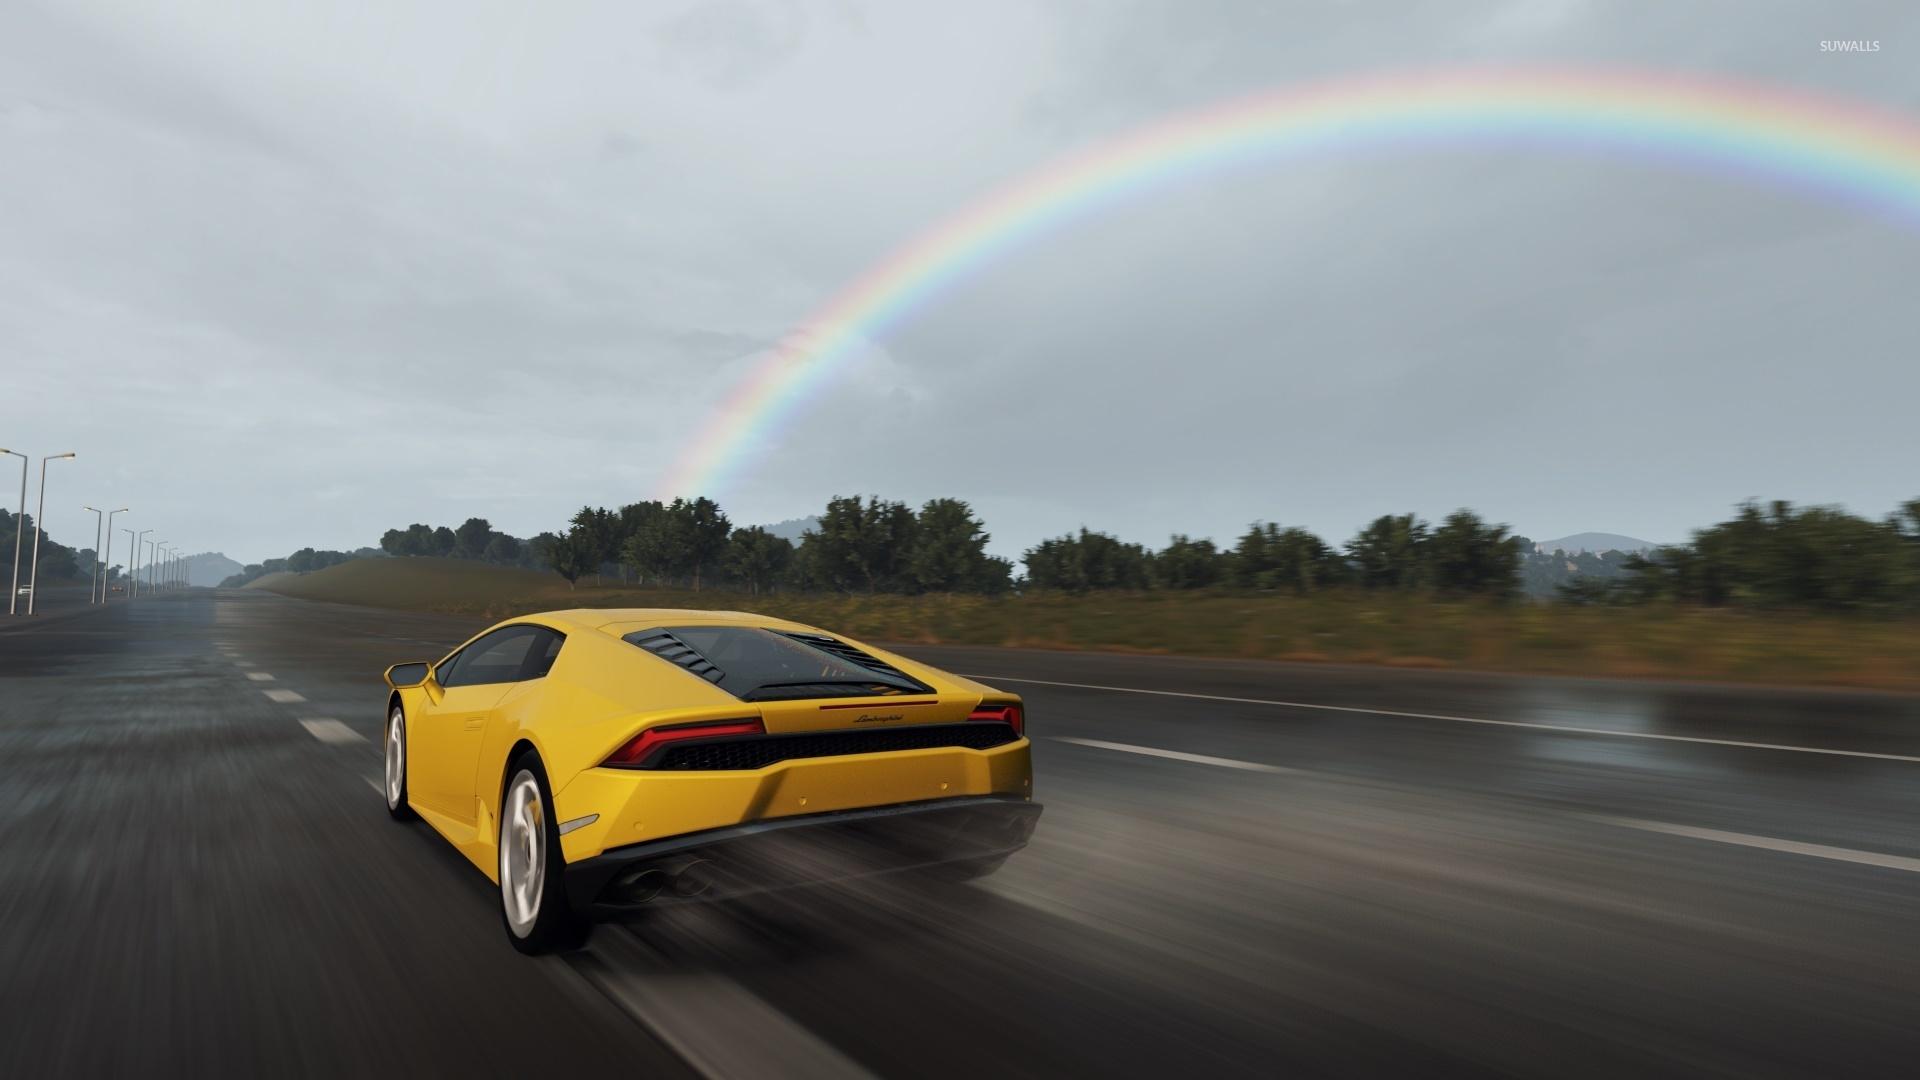 lamborghini-huracan-lp-610-4-forza-horizon-2-35054-1920x1080 Elegant Lamborghini Huracan forza Horizon 2 Cars Trend